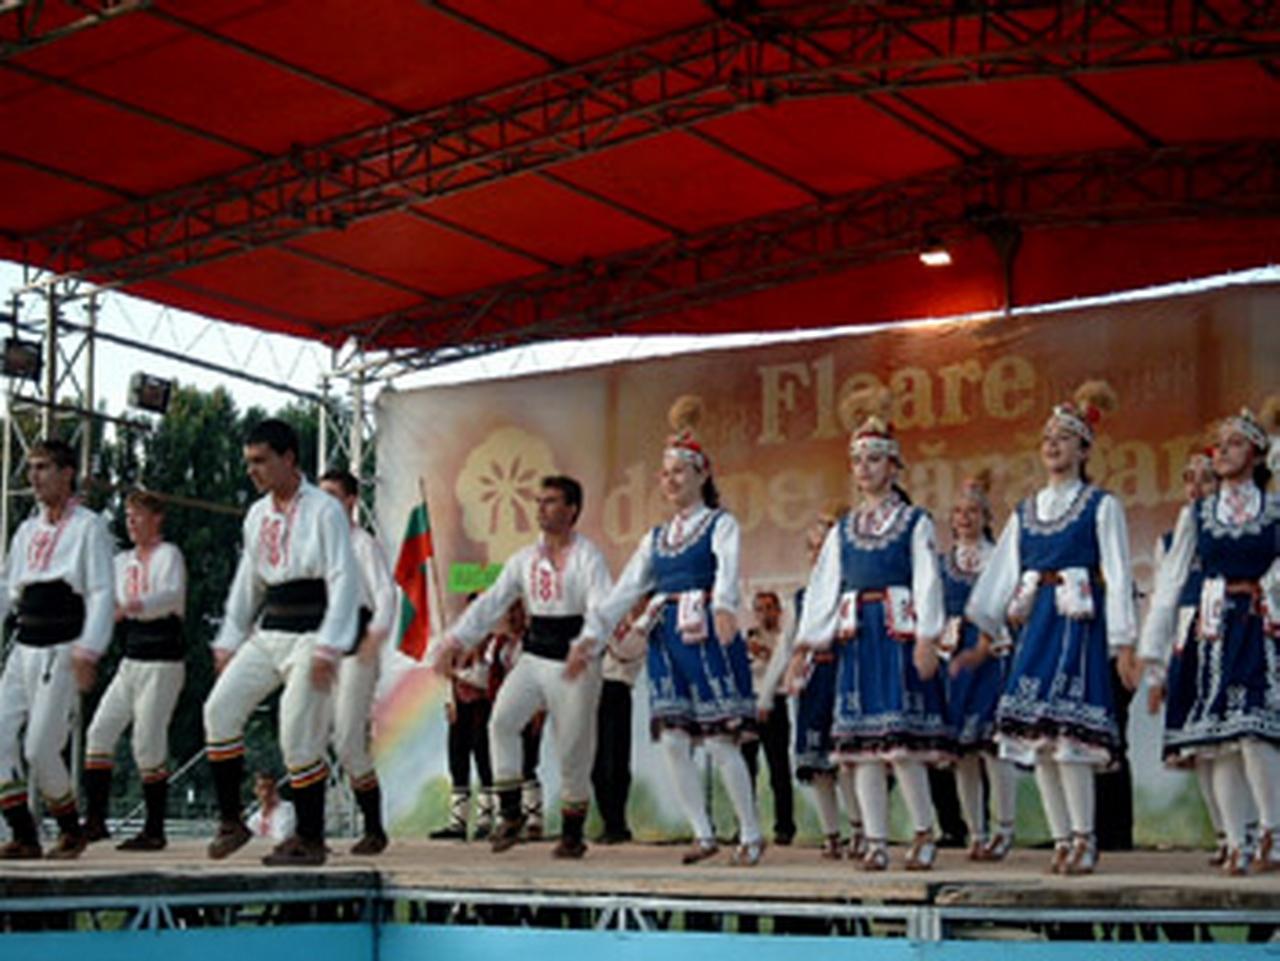 2003 - Ansamblul folcloric din Inzovo - Bulgaria